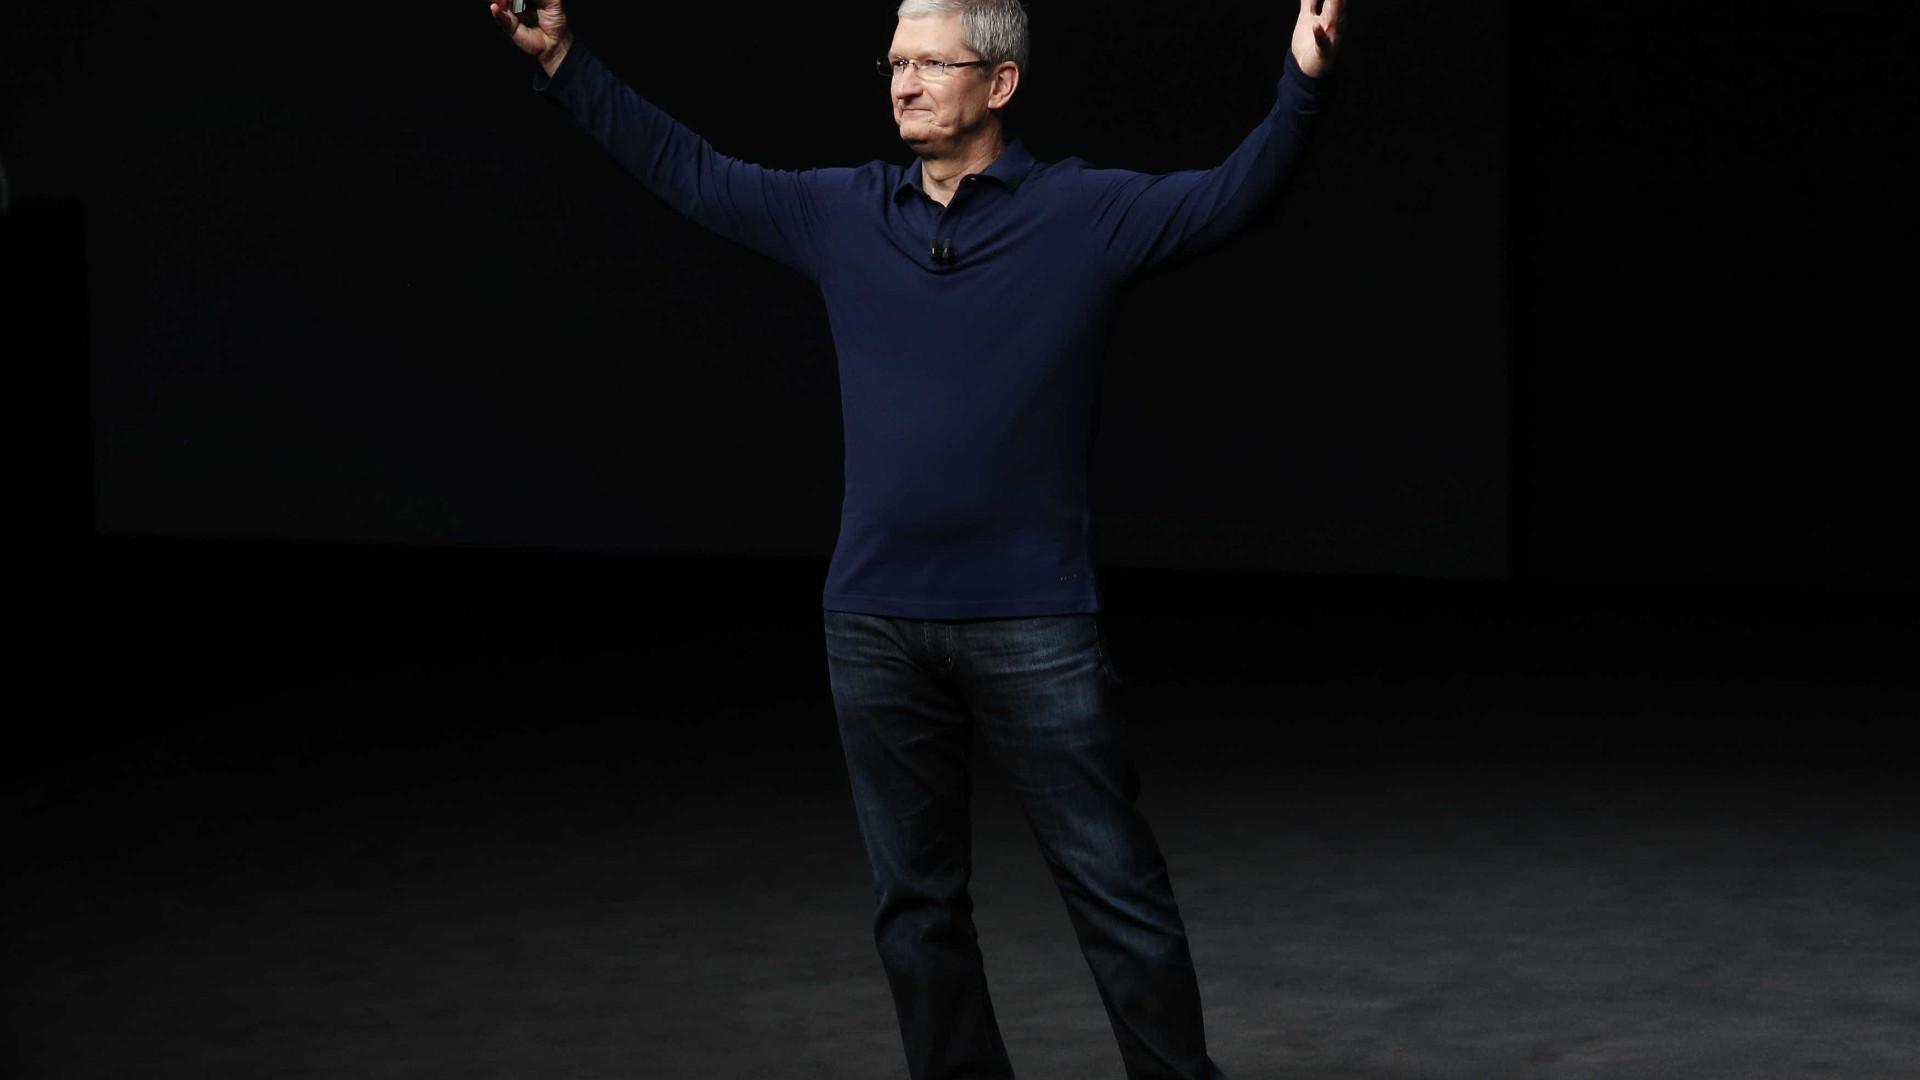 Líder da Apple aproveita entrevista para lançar 'farpa' ao Spotify